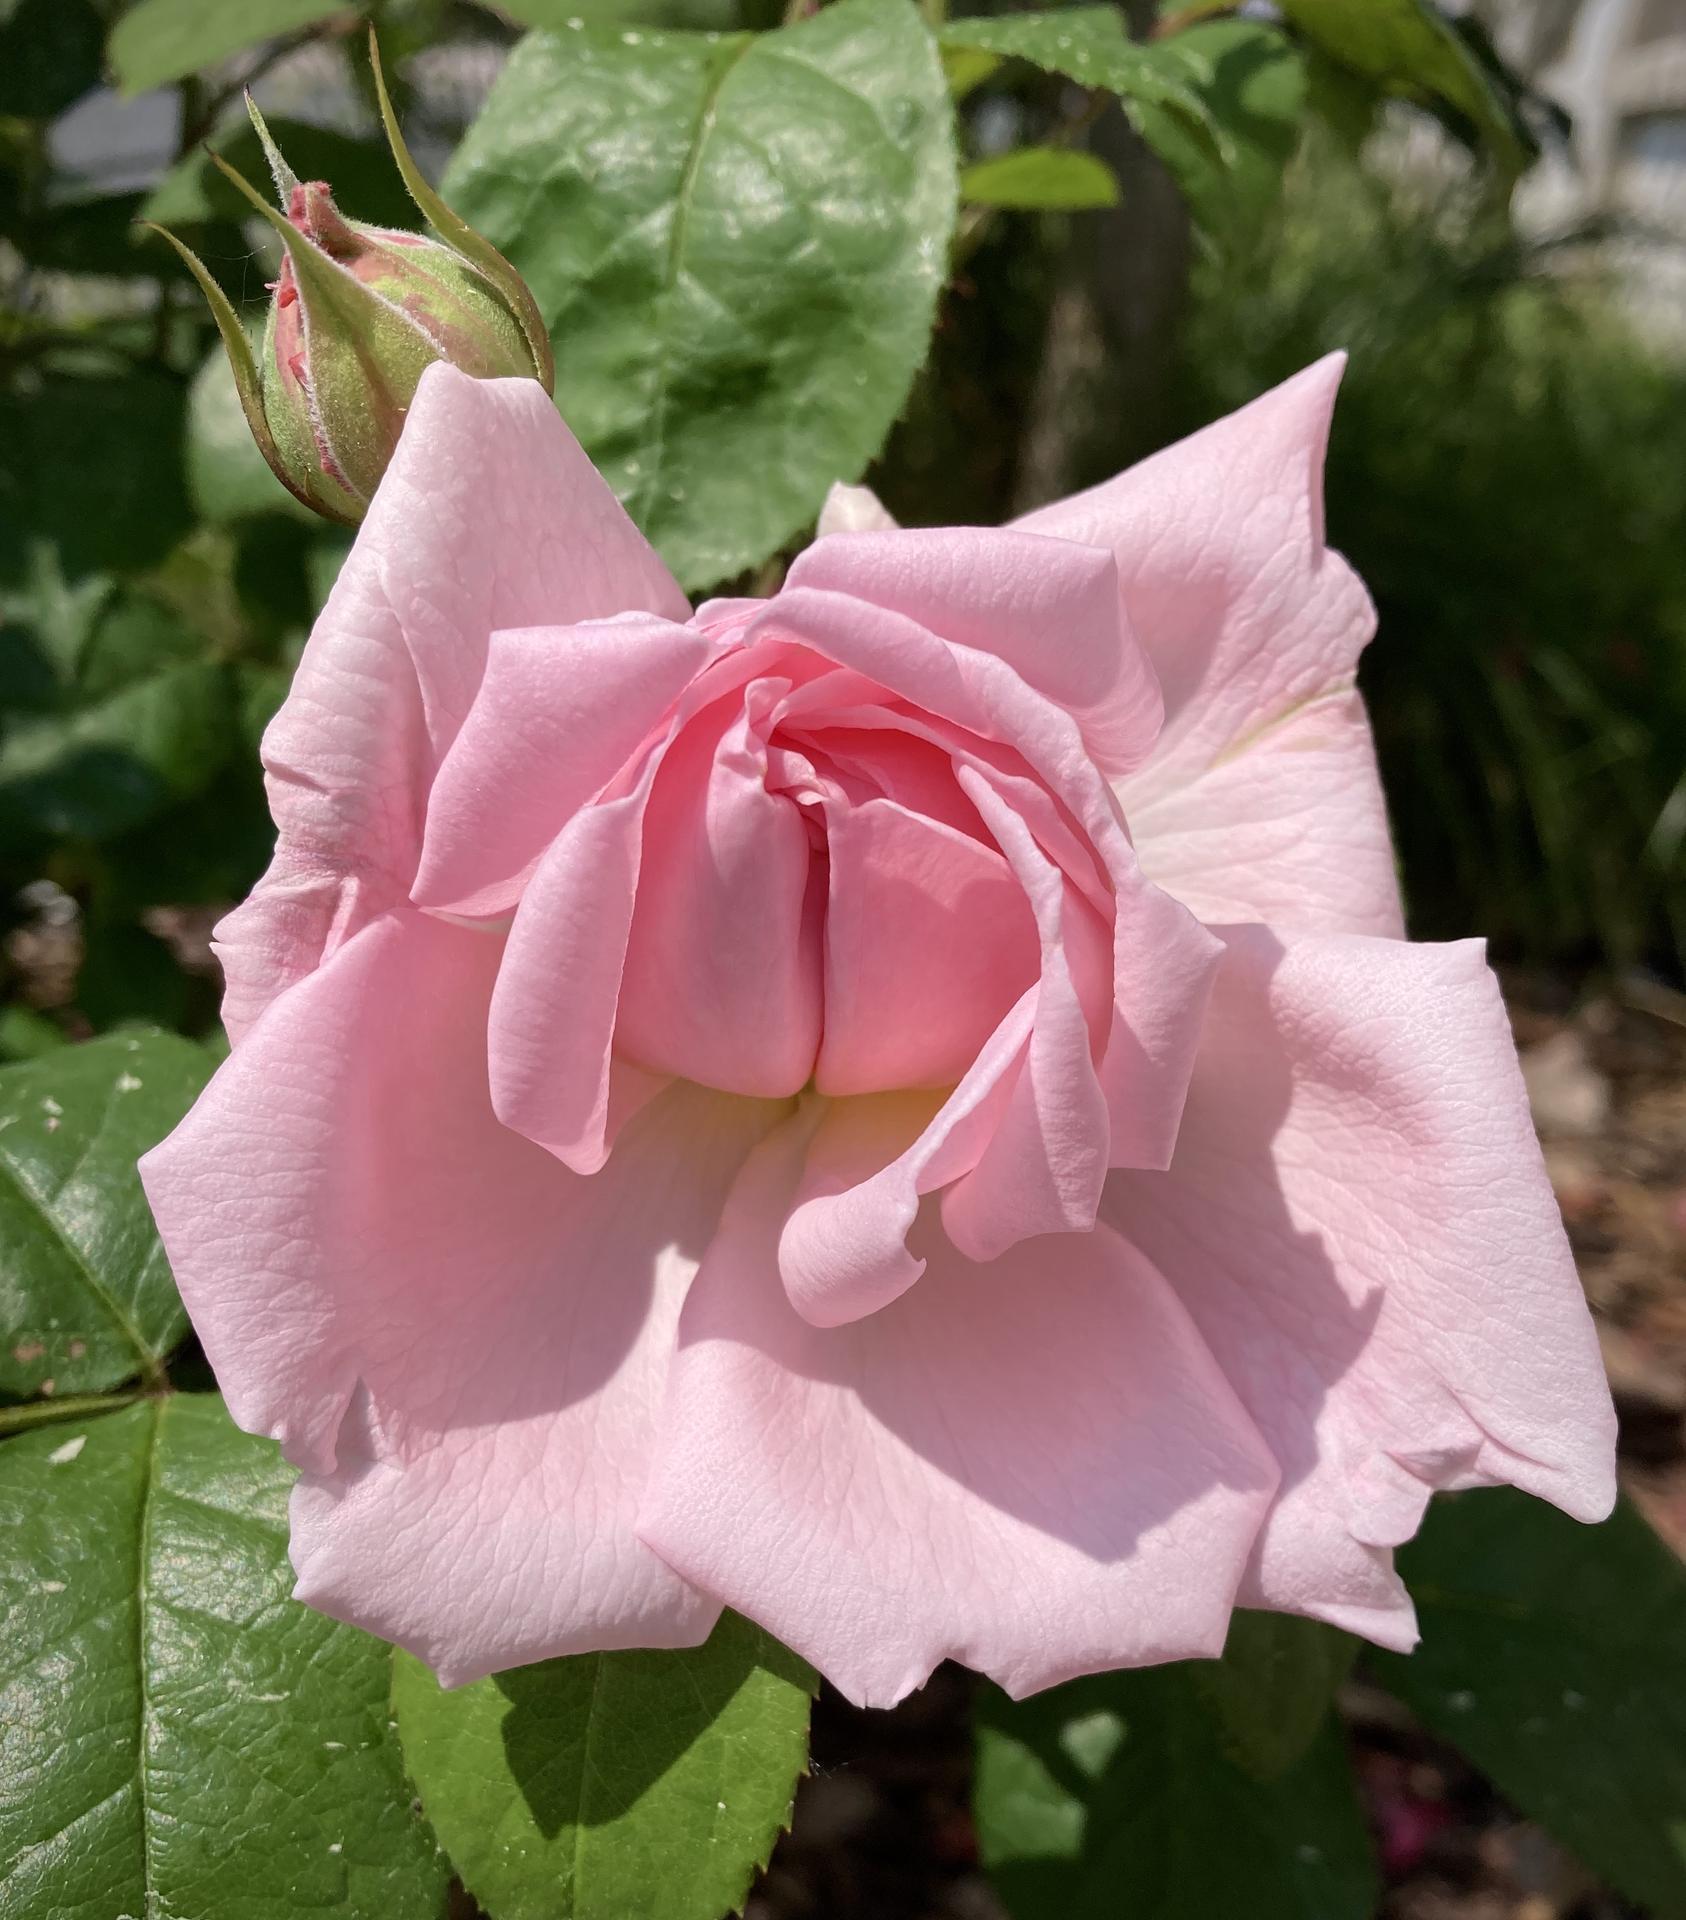 Zahrada 2021 - Vitez letosniho zavodu o prvni kvet sezony- Eglantyne ❤️